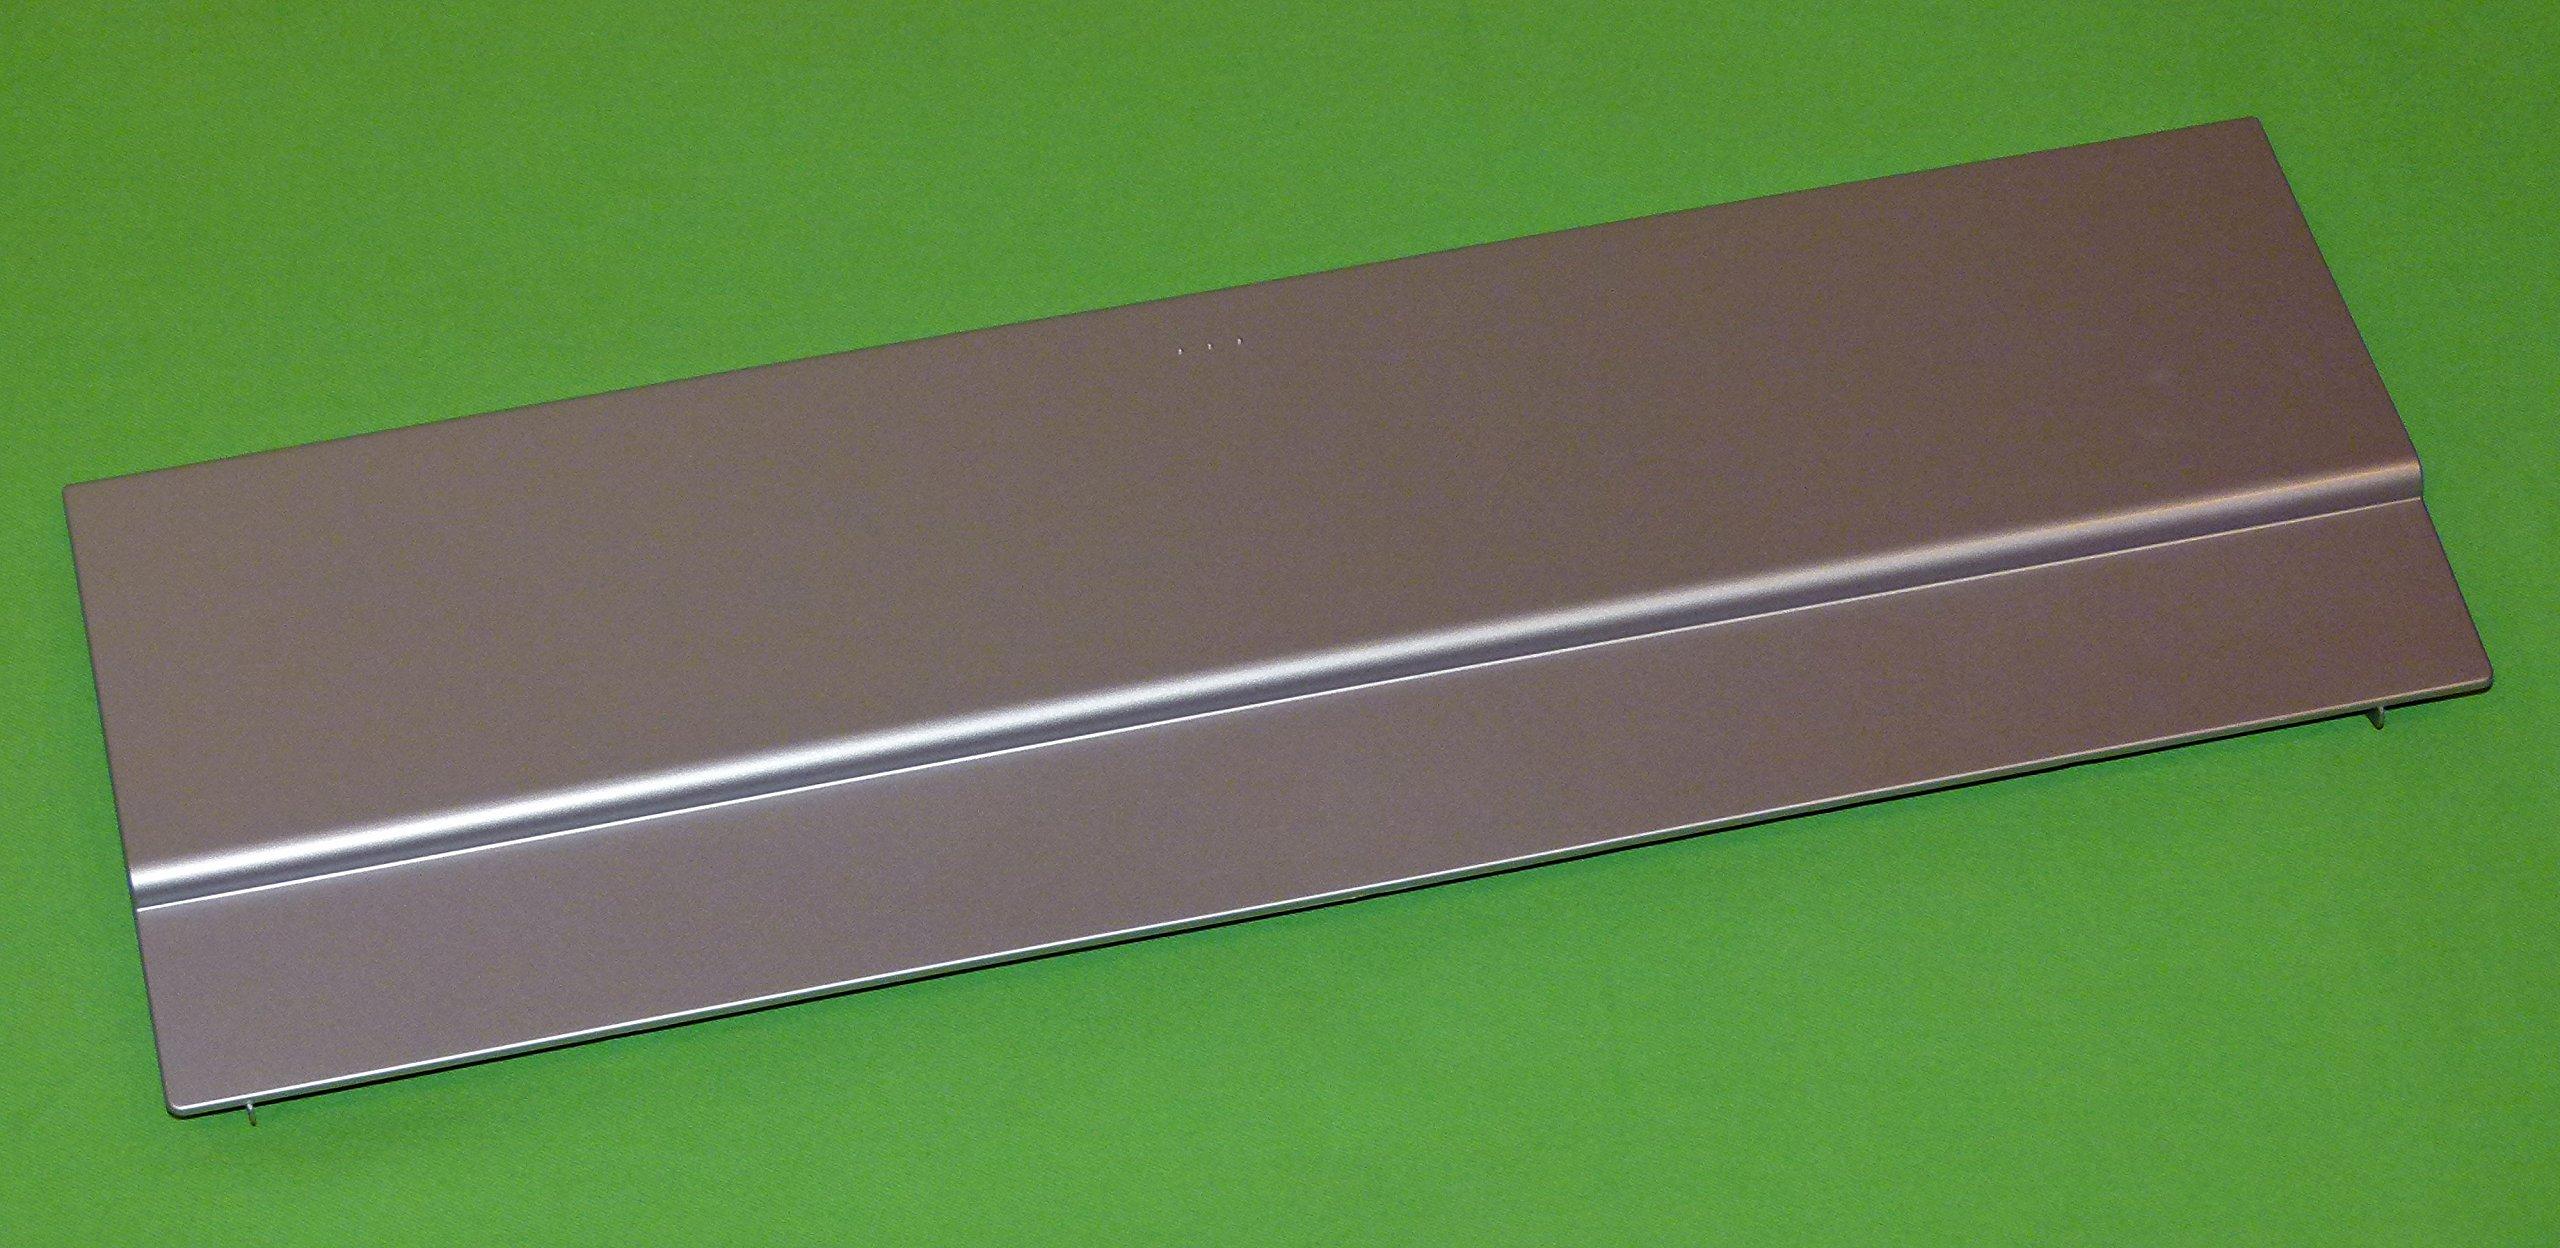 OEM Epson Paper Stacker Output Tray: Stylus Pro 3800, Stylus Pro 3800c, Stylus Pro 3850, Stylus Pro 3880, Stylus Pro 3885, Stylus Pro 3890